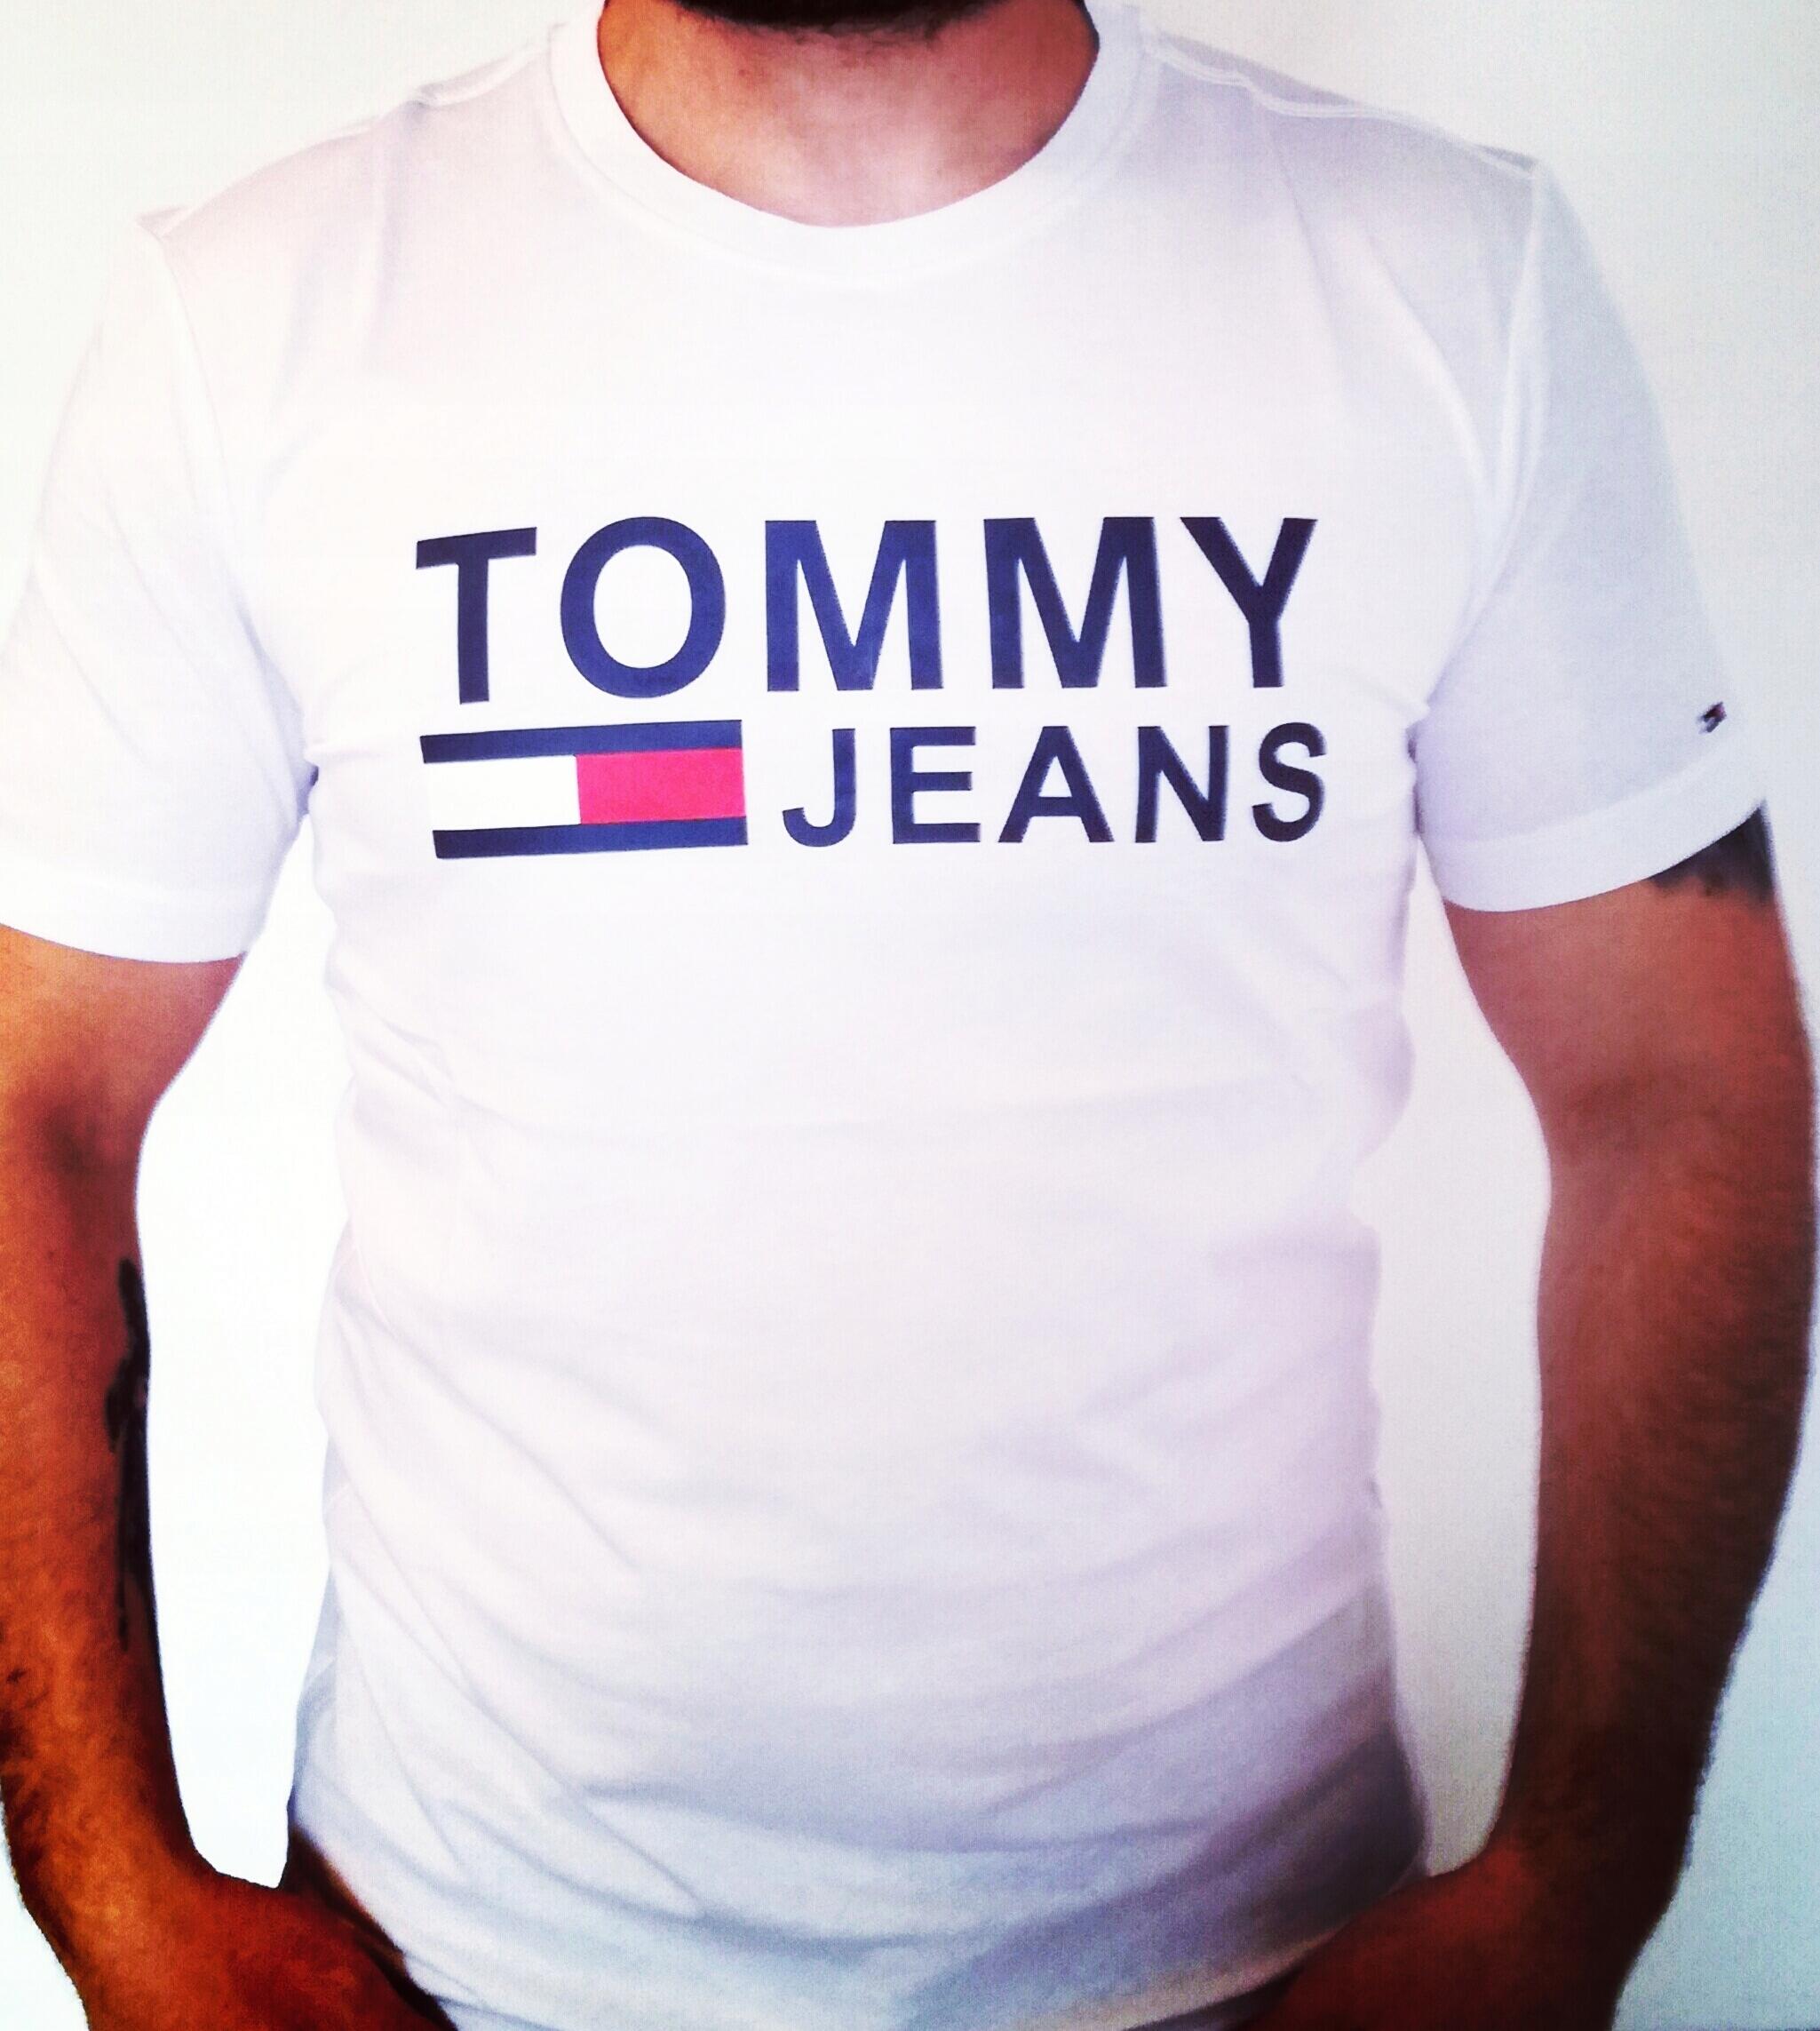 Koszulka męska T-Shirt TOMMY HILFIGER r S bluzka